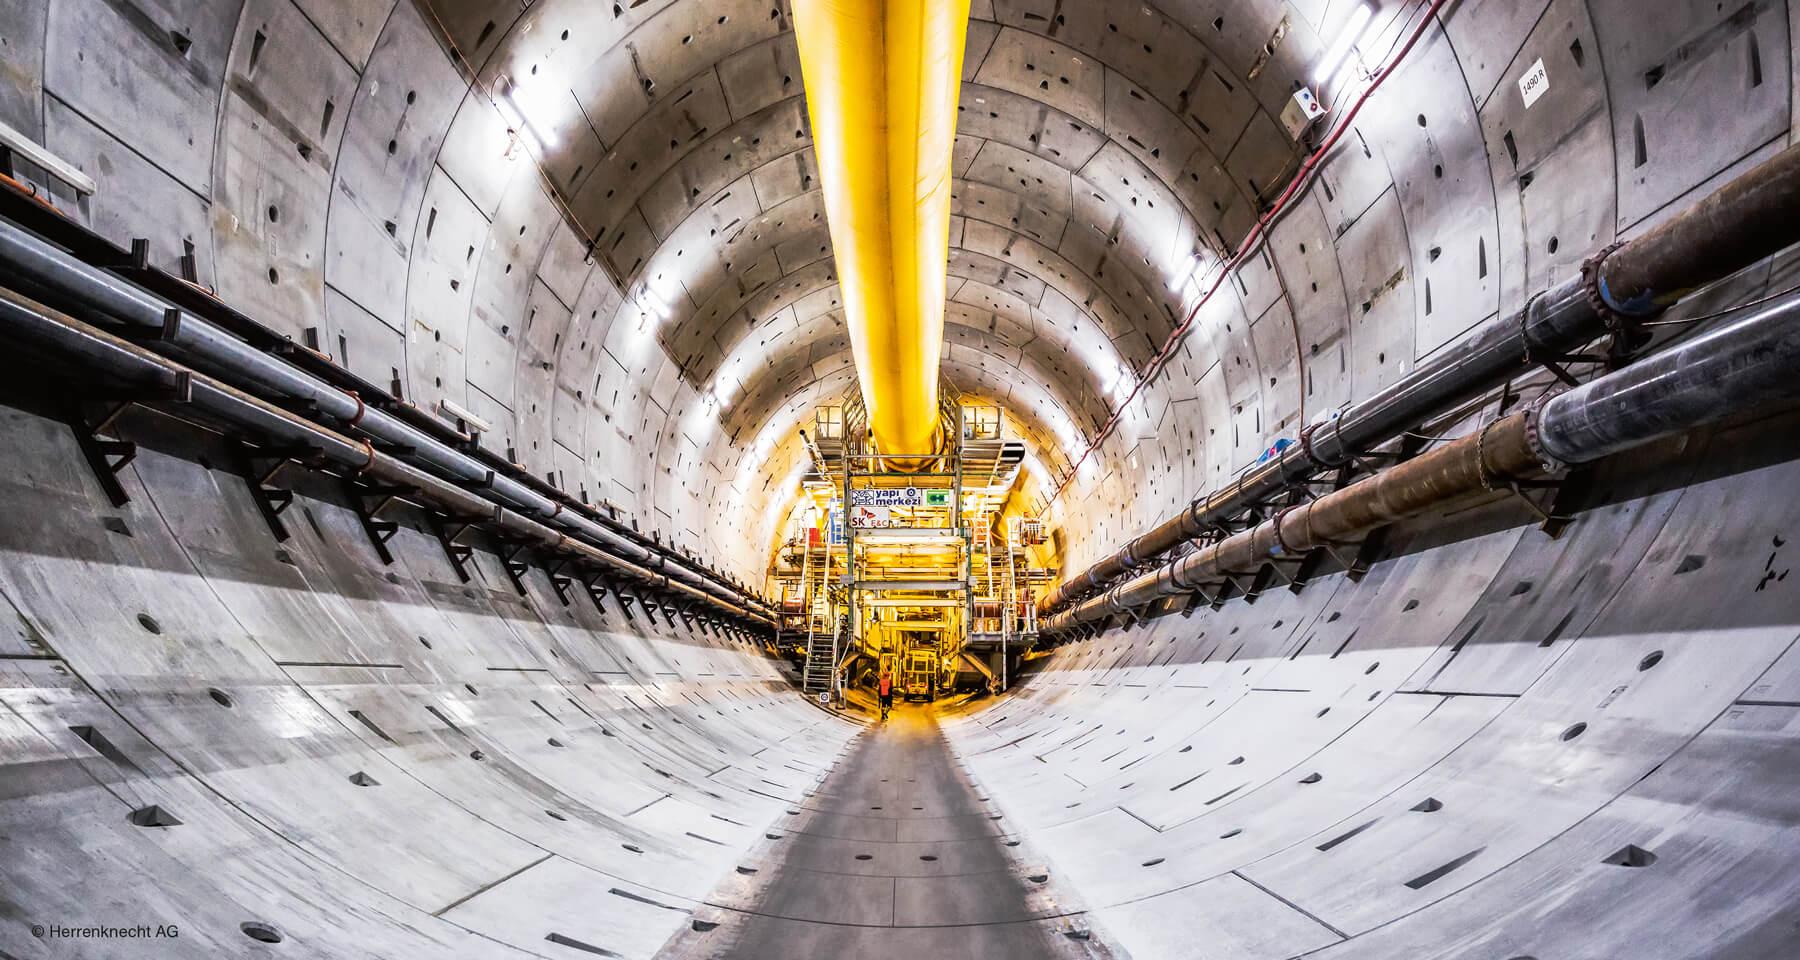 Riesige Tunnelbohrmaschinen schaffen den Weg durch Bergmassive.